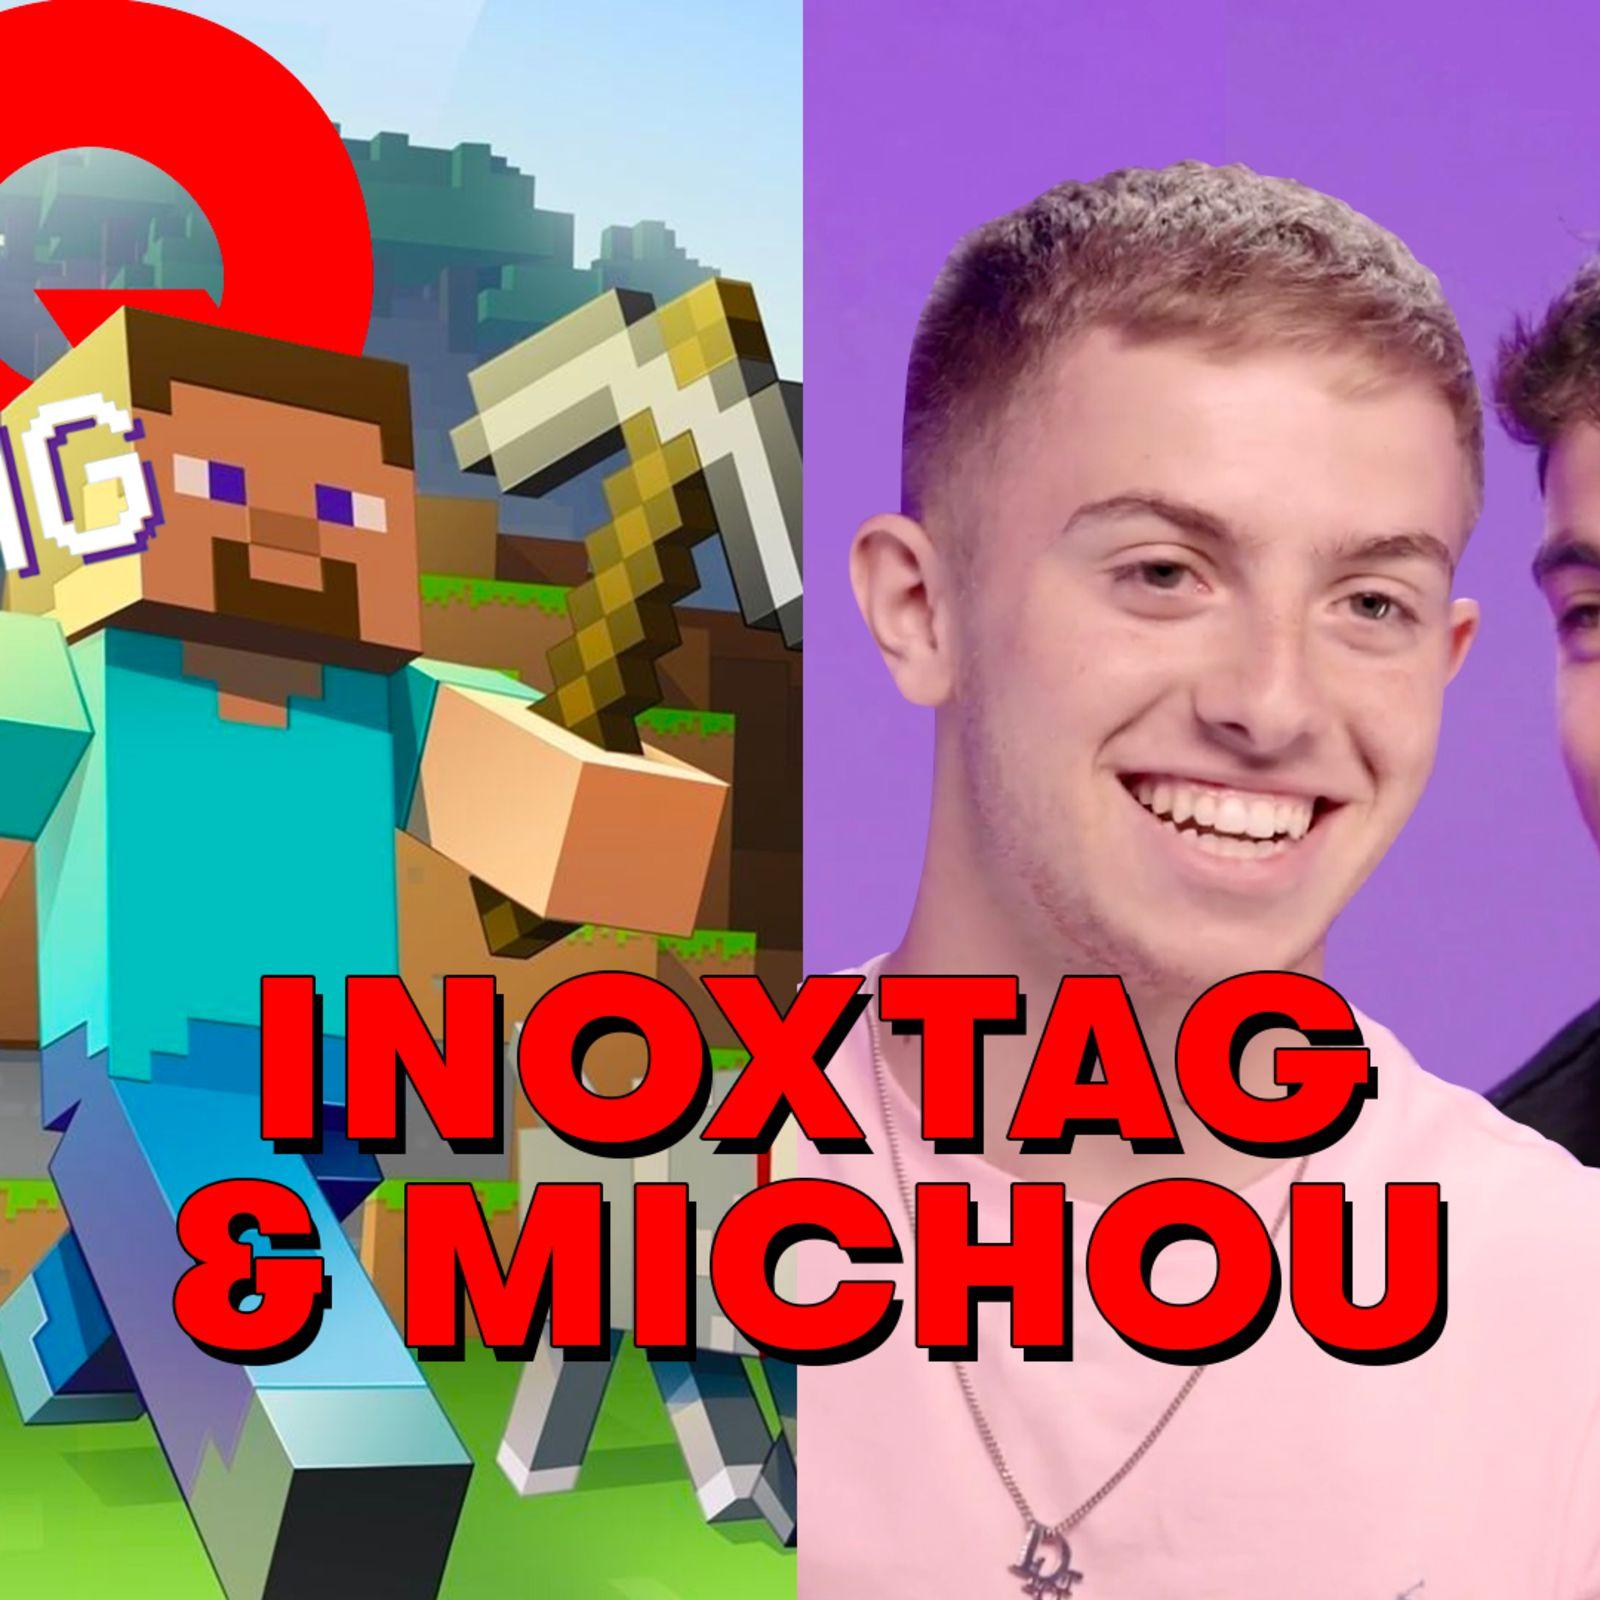 Michou et Inoxtag jugent 6 succès du gaming | Minecraft, Among Us, Super Mario Bros